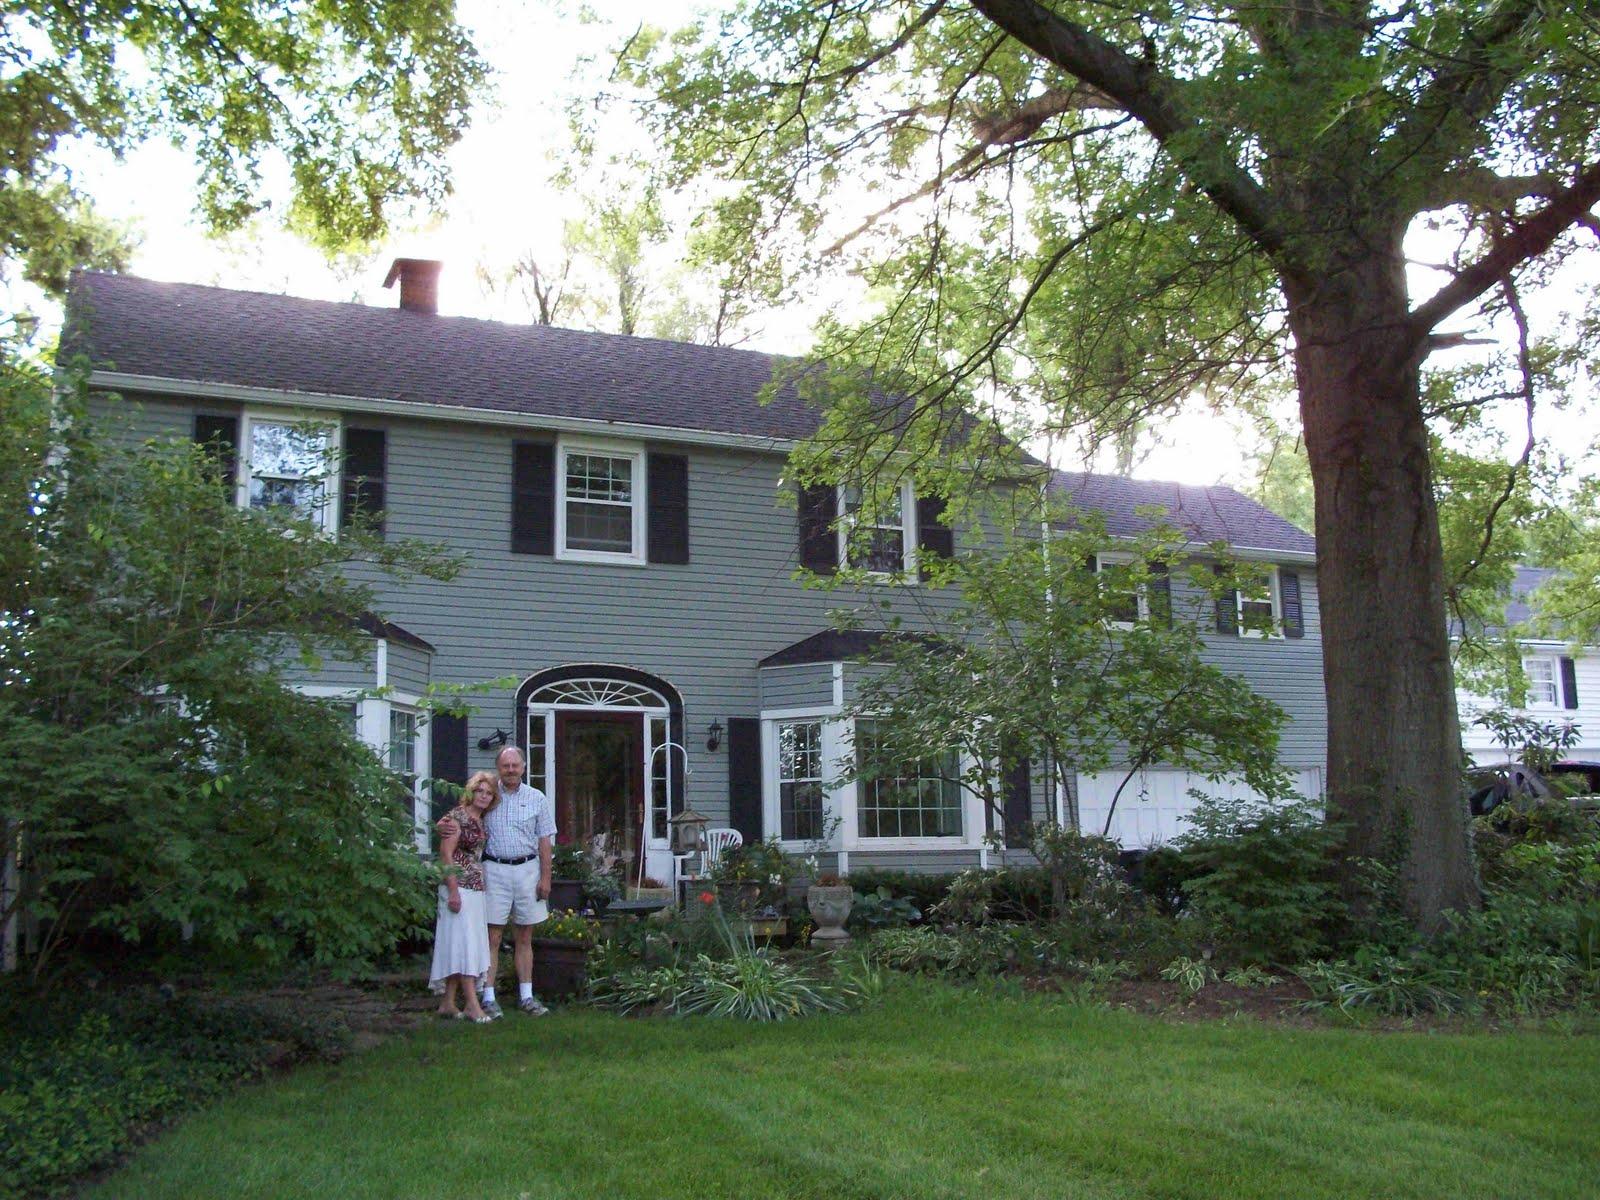 http://1.bp.blogspot.com/_6uqTs3hPXN8/S_whDxT3RoI/AAAAAAAAGCc/3FjxDqULru8/s1600/9-29+Carol%27s+home+(2).JPG